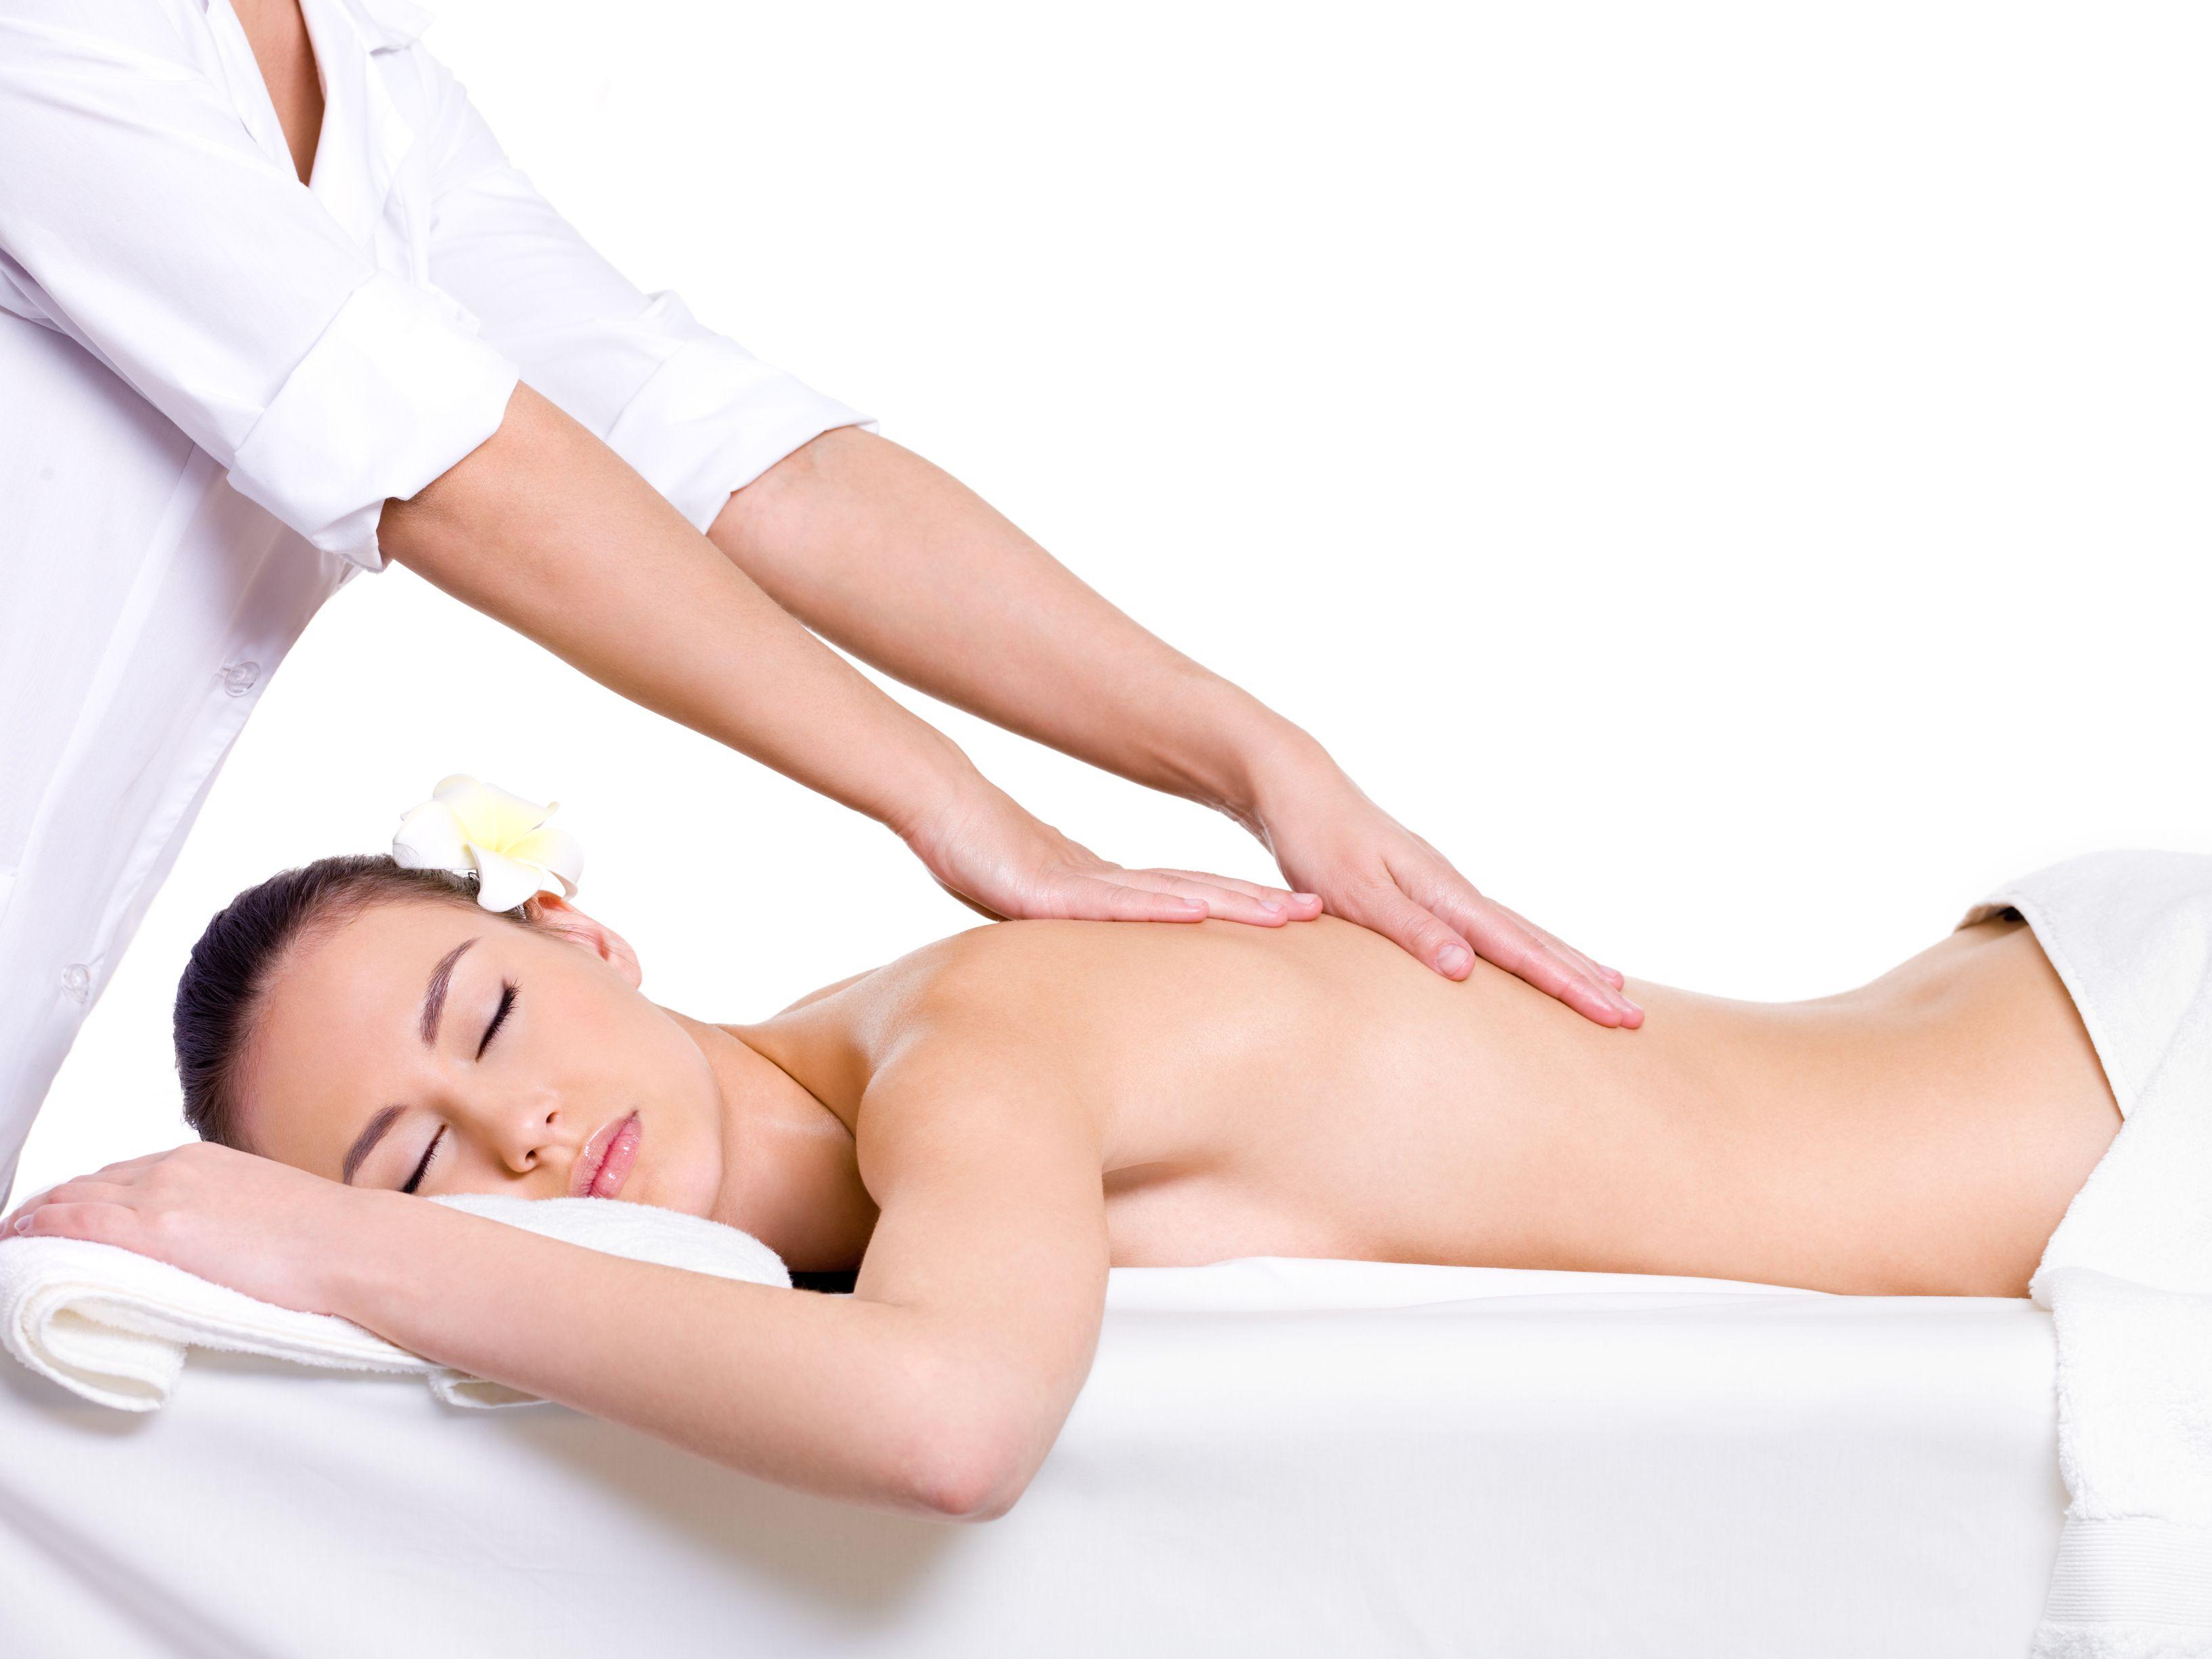 neuken private body to body massage